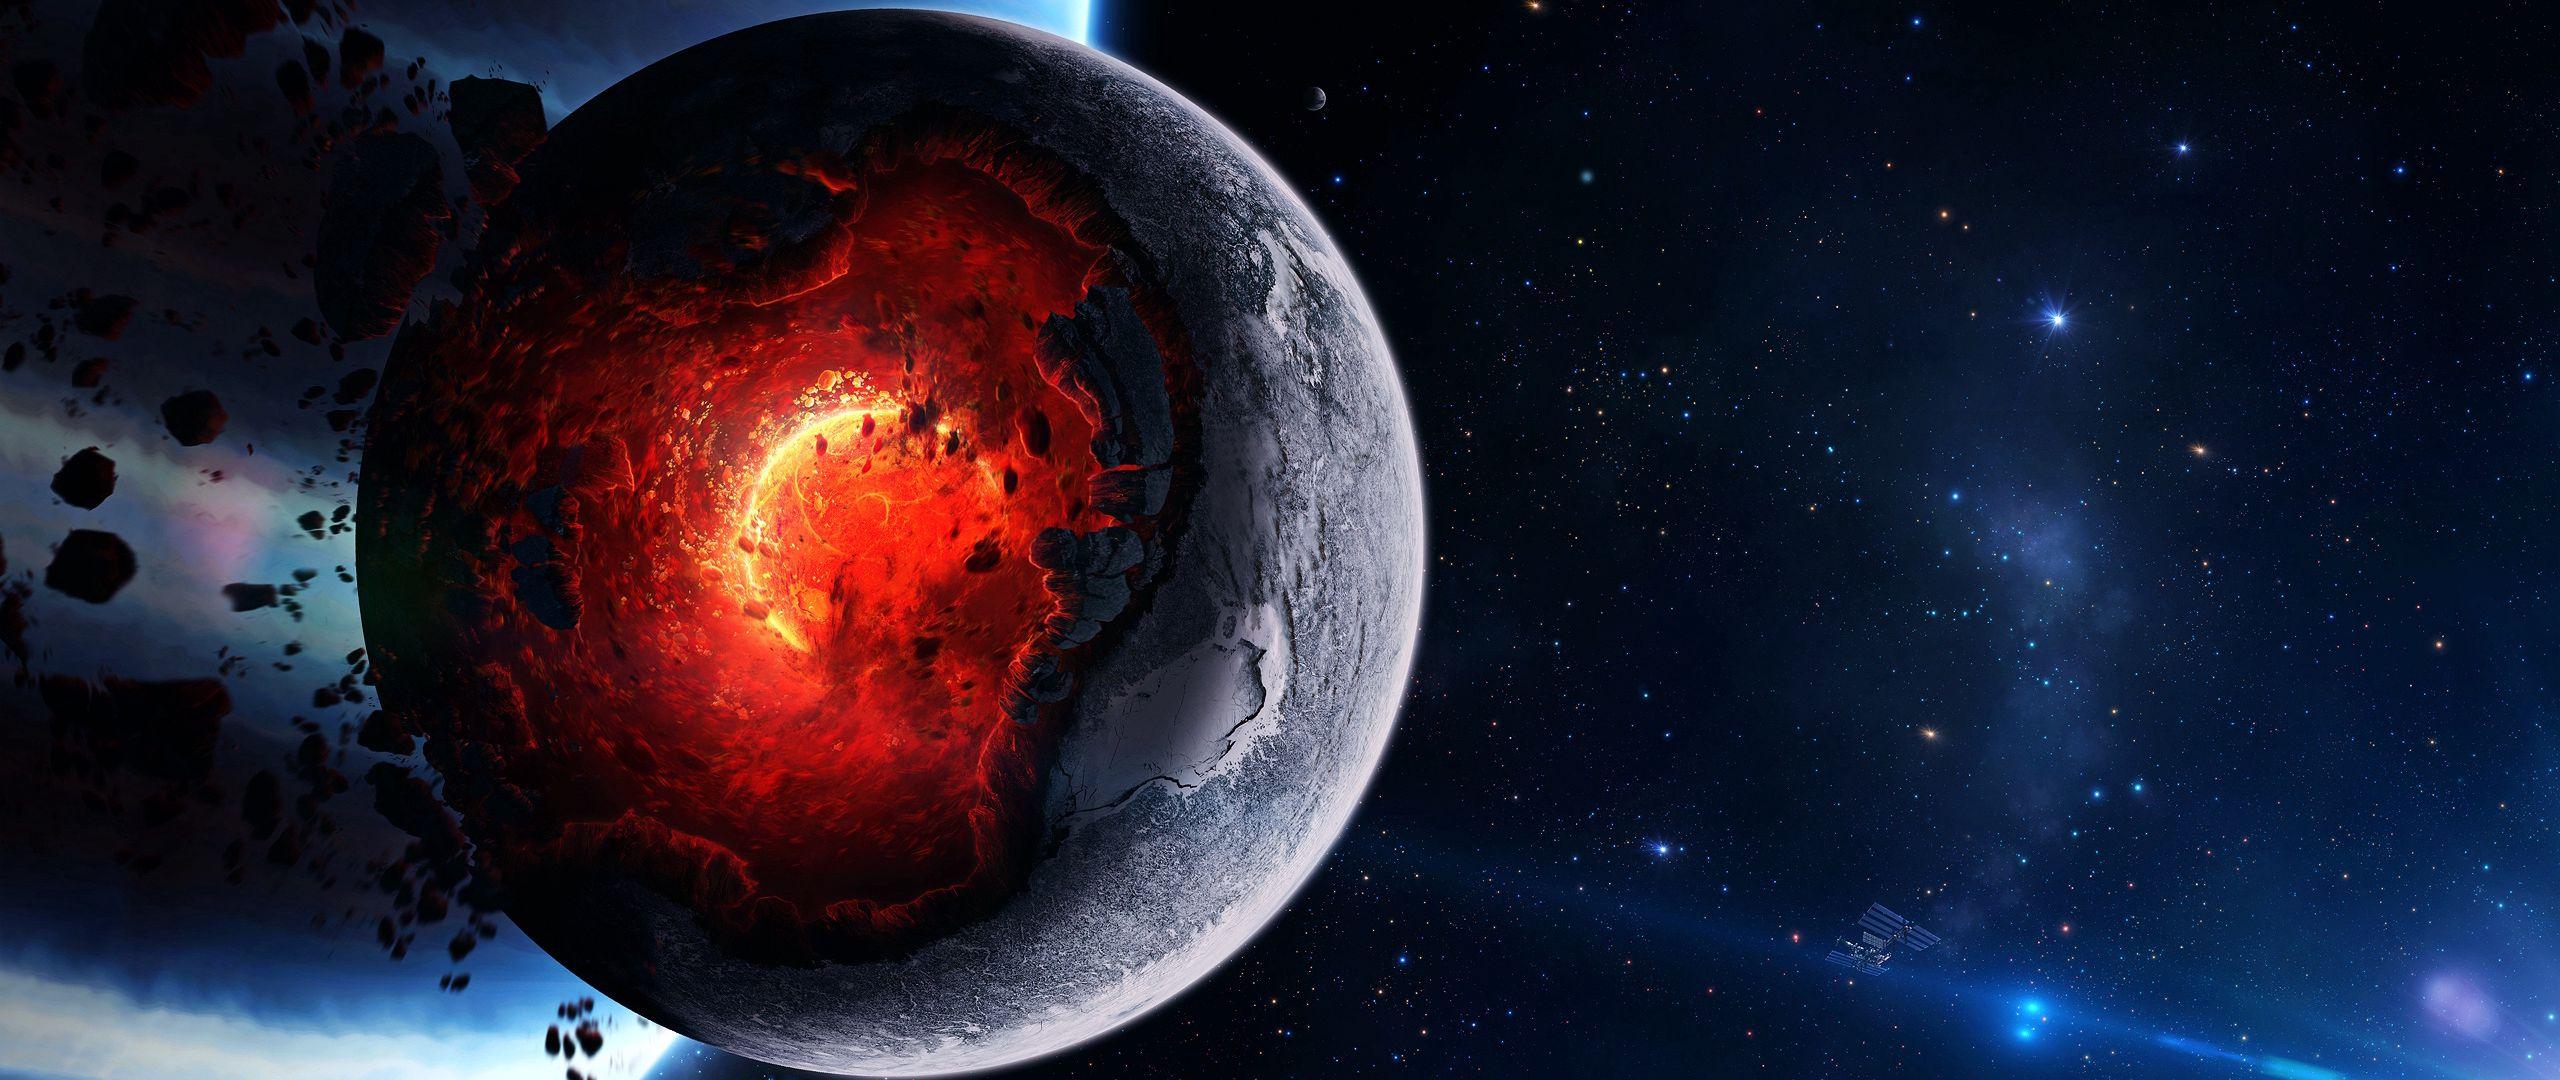 Fondos de pantalla Nucleo de la tierra